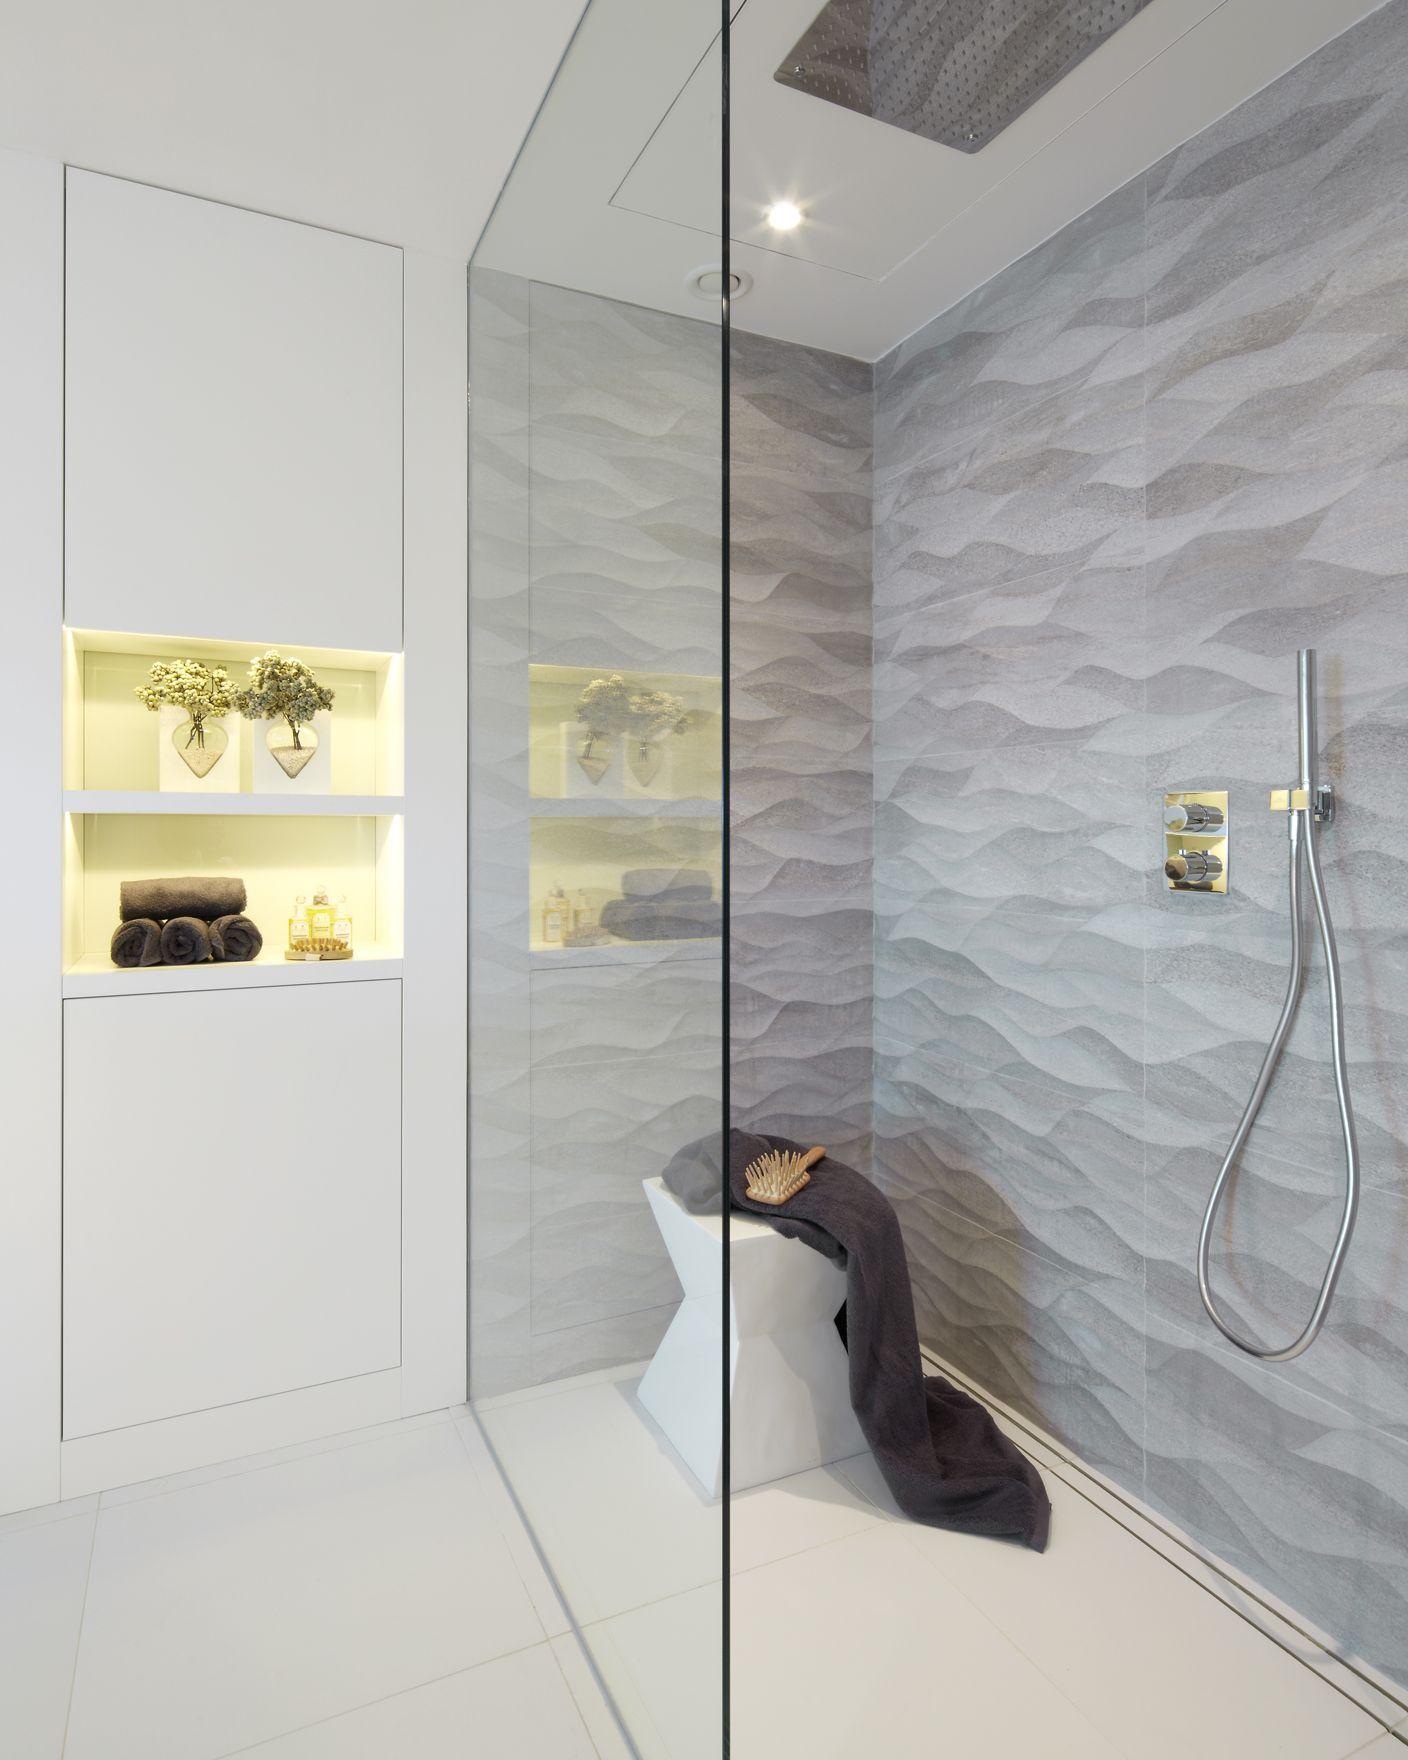 Molins interiors arquitectura interior interiorismo - Hornacina bano ...